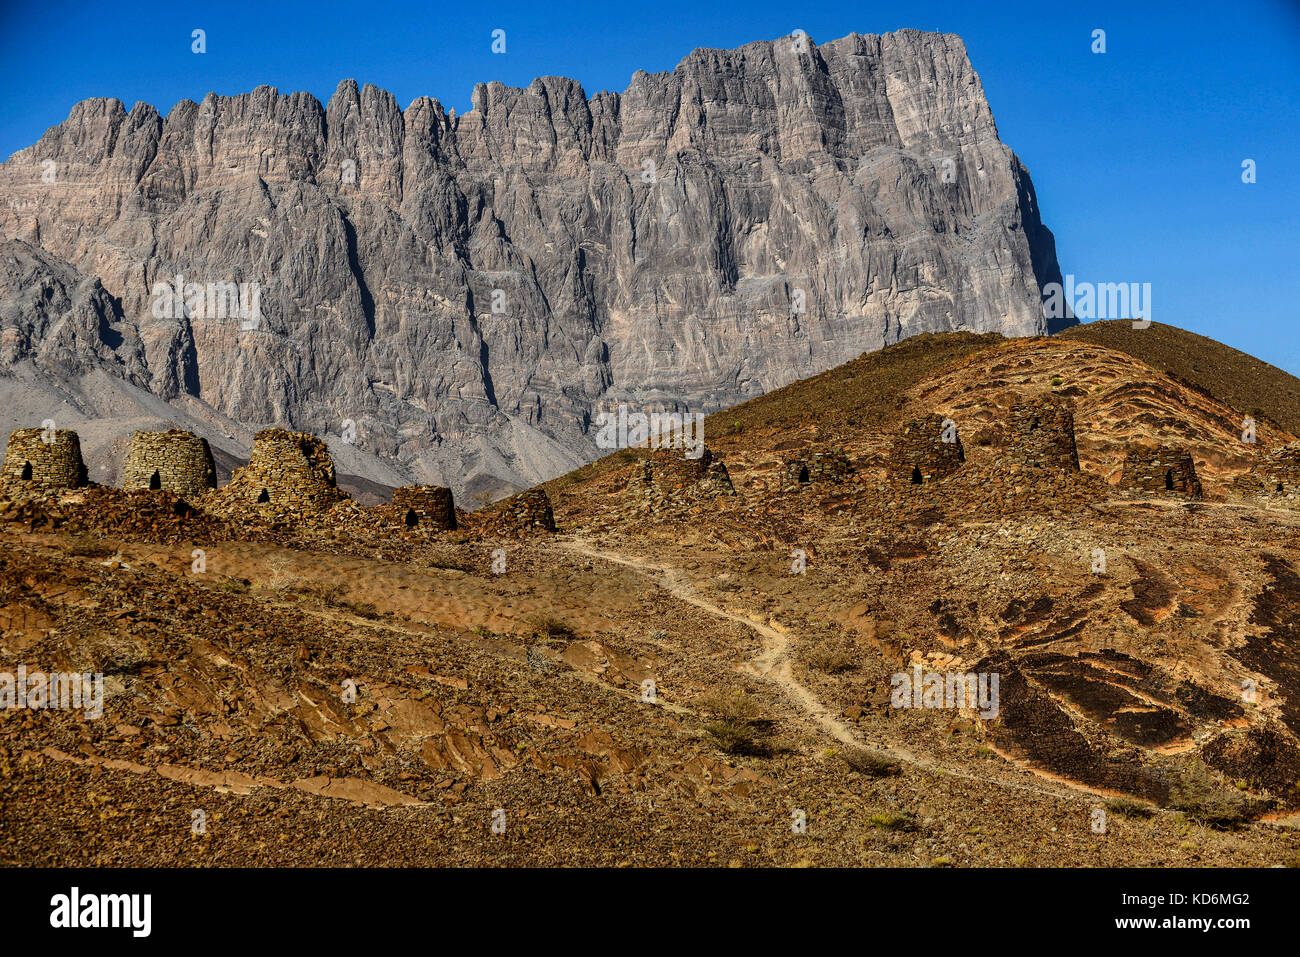 The Beehve tombs at Jabal Misht, Sultanate of Oman. - Stock Image